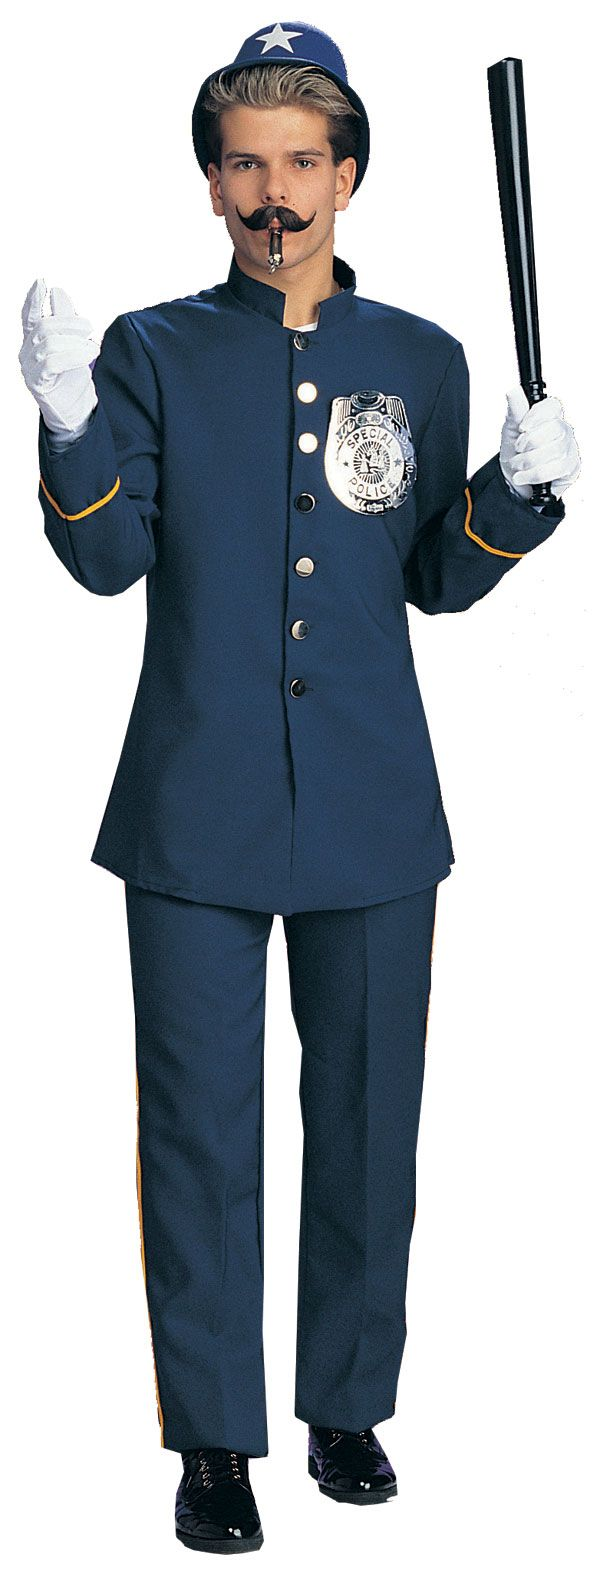 Keystone Cop Adult Costume - Police Costumes.  $40.  Costume Craze.  Men's.